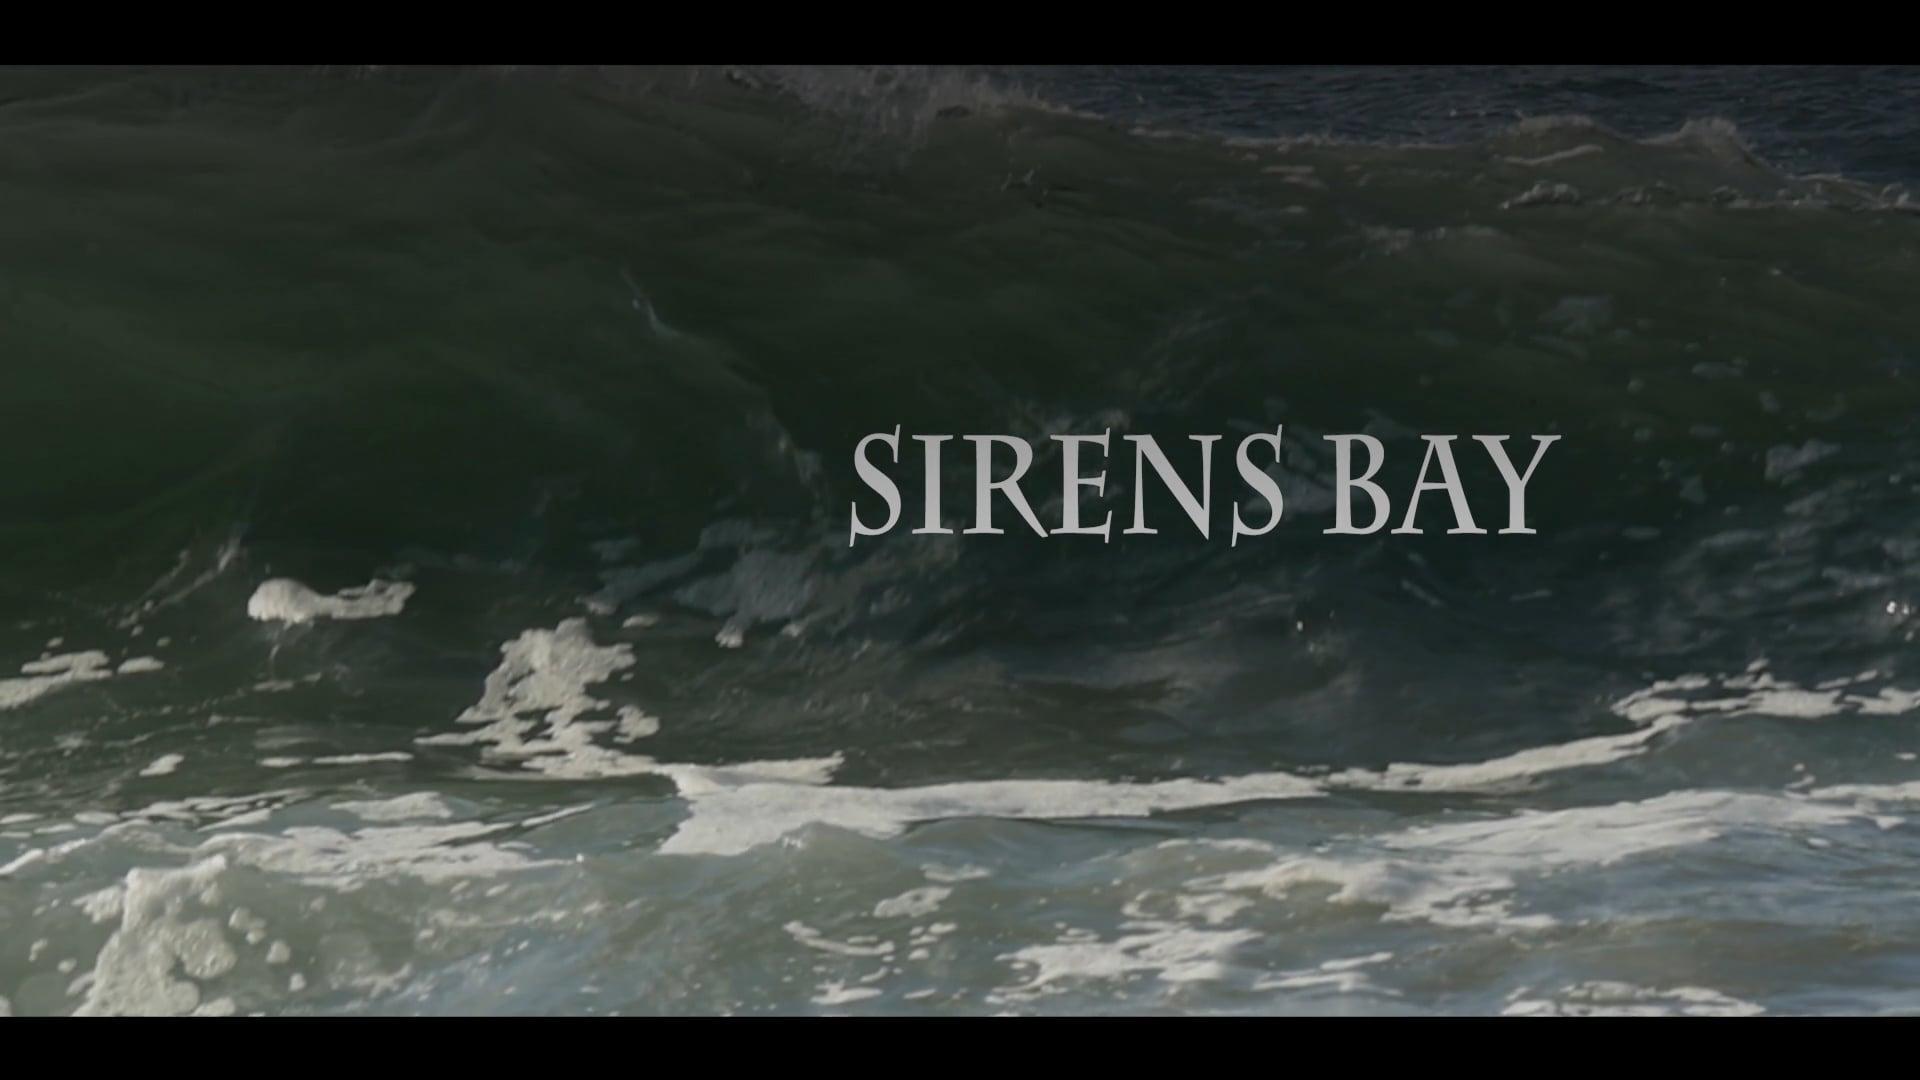 Sirens Bay